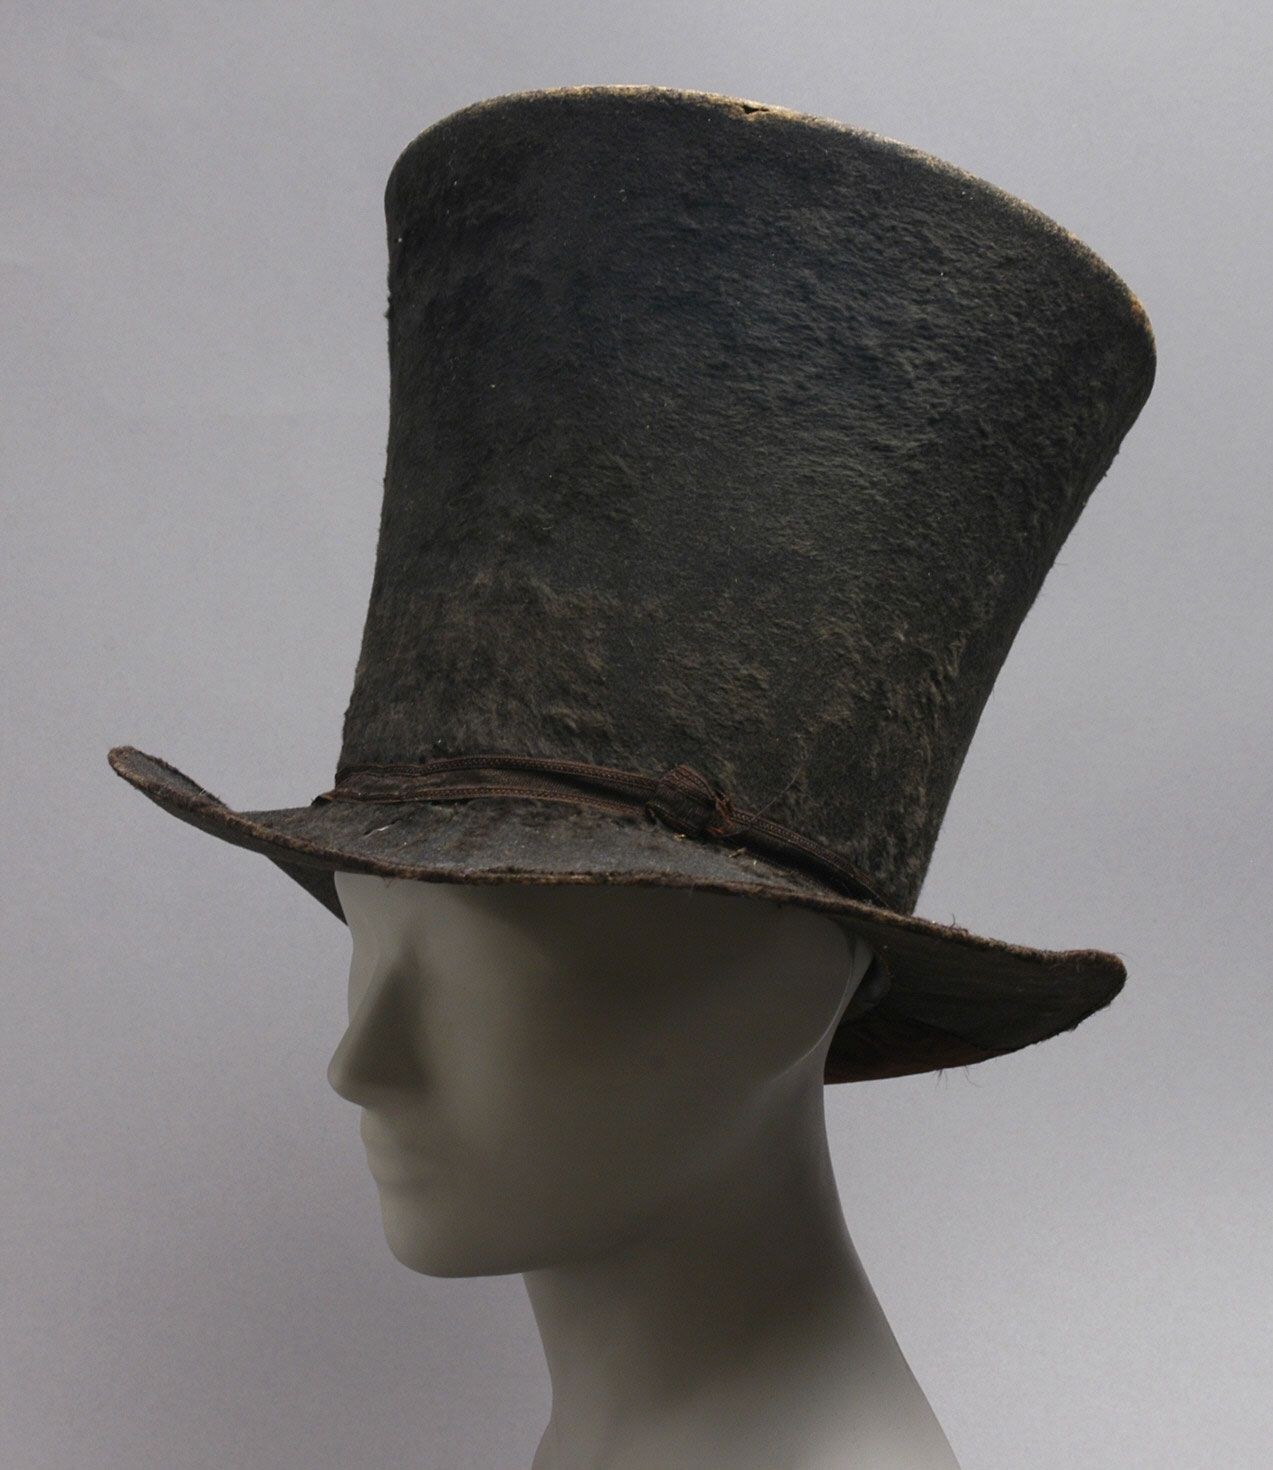 b15446e2e0d Philadelphia Museum of Art - Collections Object   Man s Hat 1820-1825